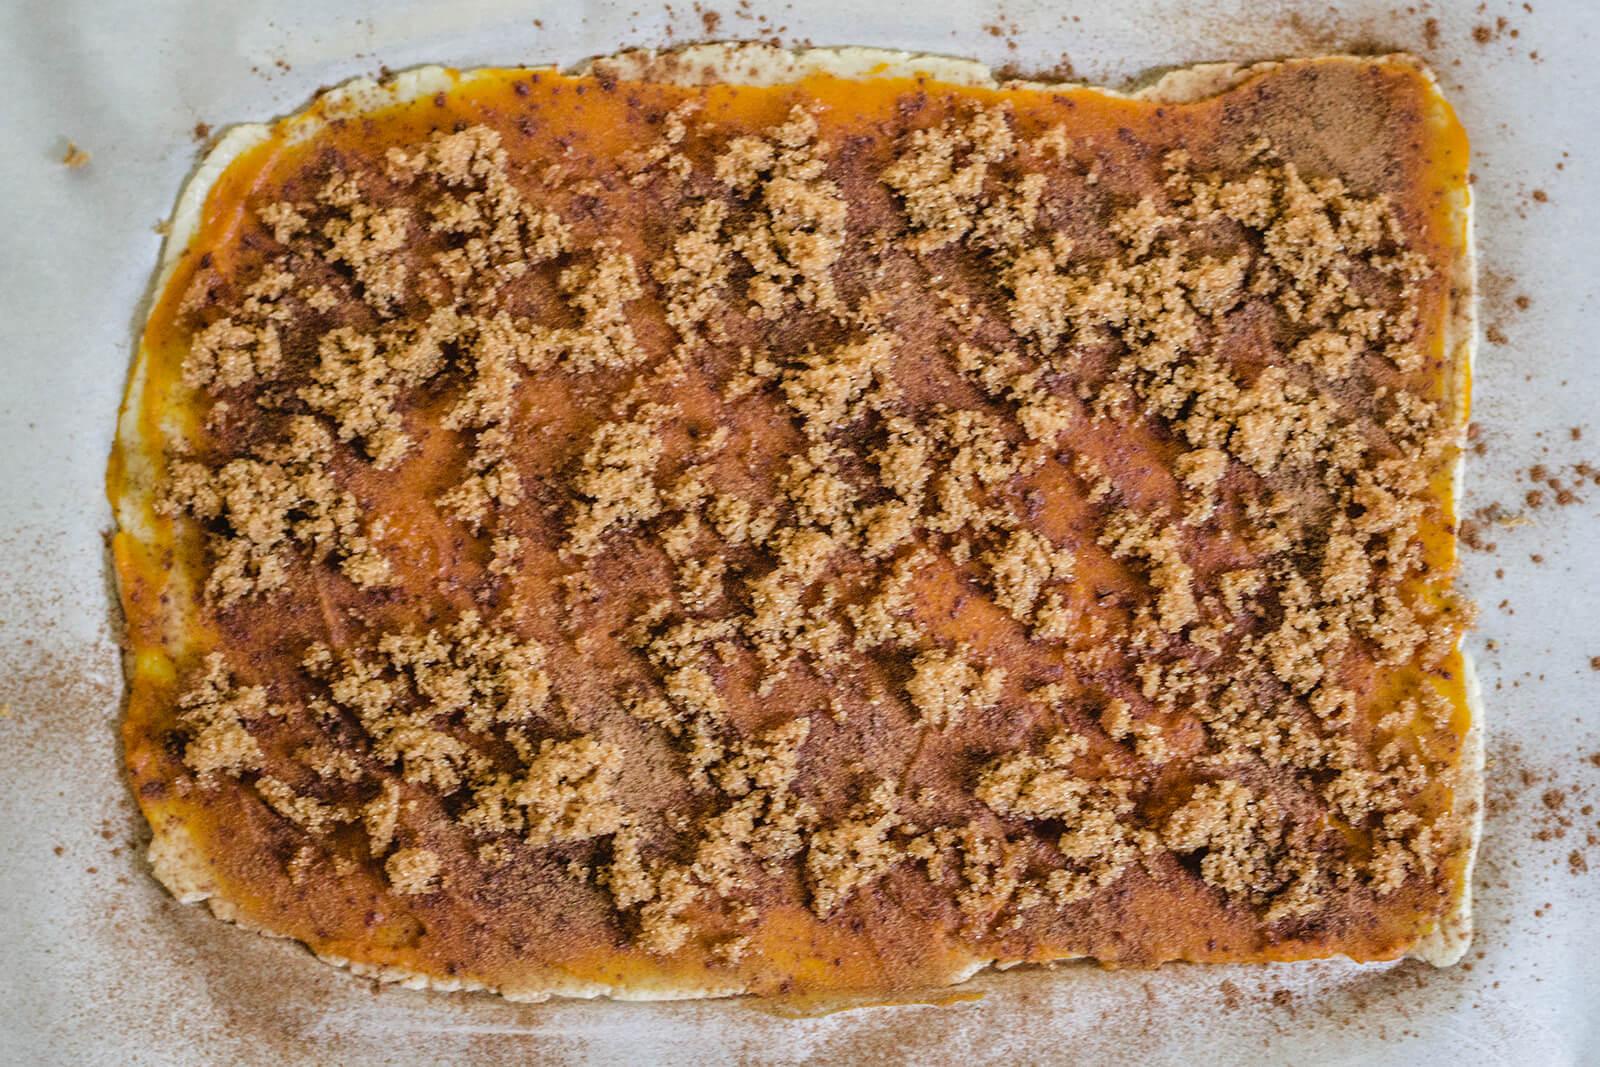 Keto Pumpkin Spice Latte Cinnamon Roll Filling